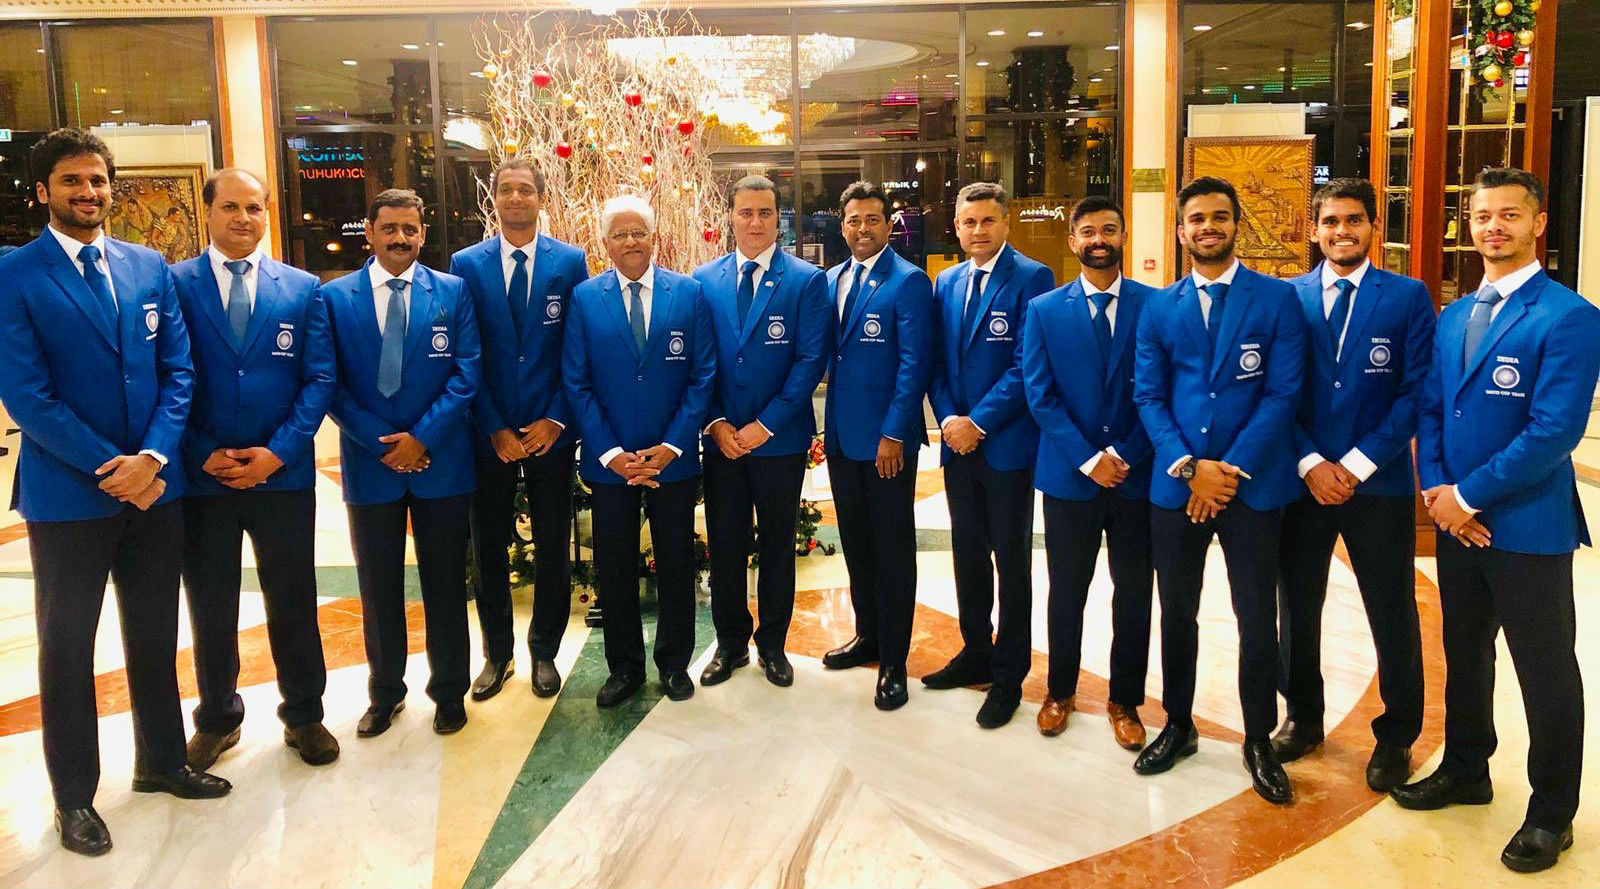 India vs Pakistan Davis Cup 2019 Match Result: Ramkumar Ramanathan, Sumit Nagal Thrash Pak as IND Lead 2-0